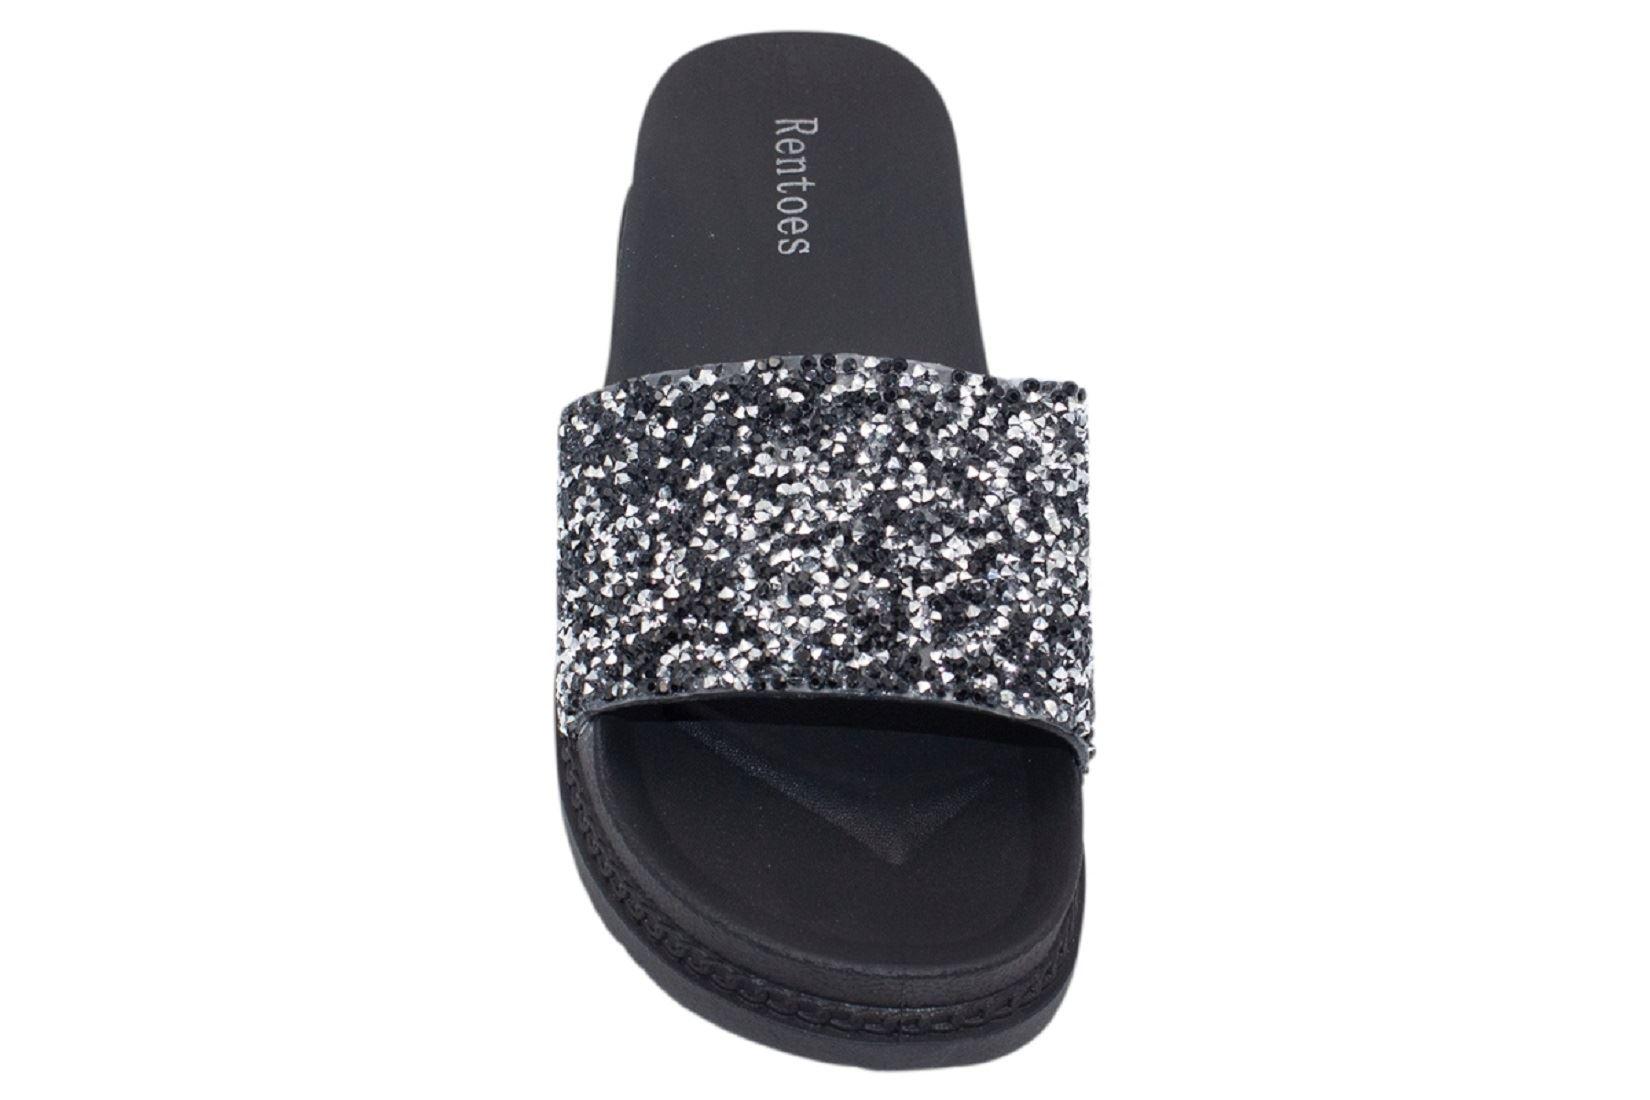 Womens-Sliders-Casual-Slippers-Mules-Ladies-Diamante-Flip-Flop-Sandals-Shoes thumbnail 27